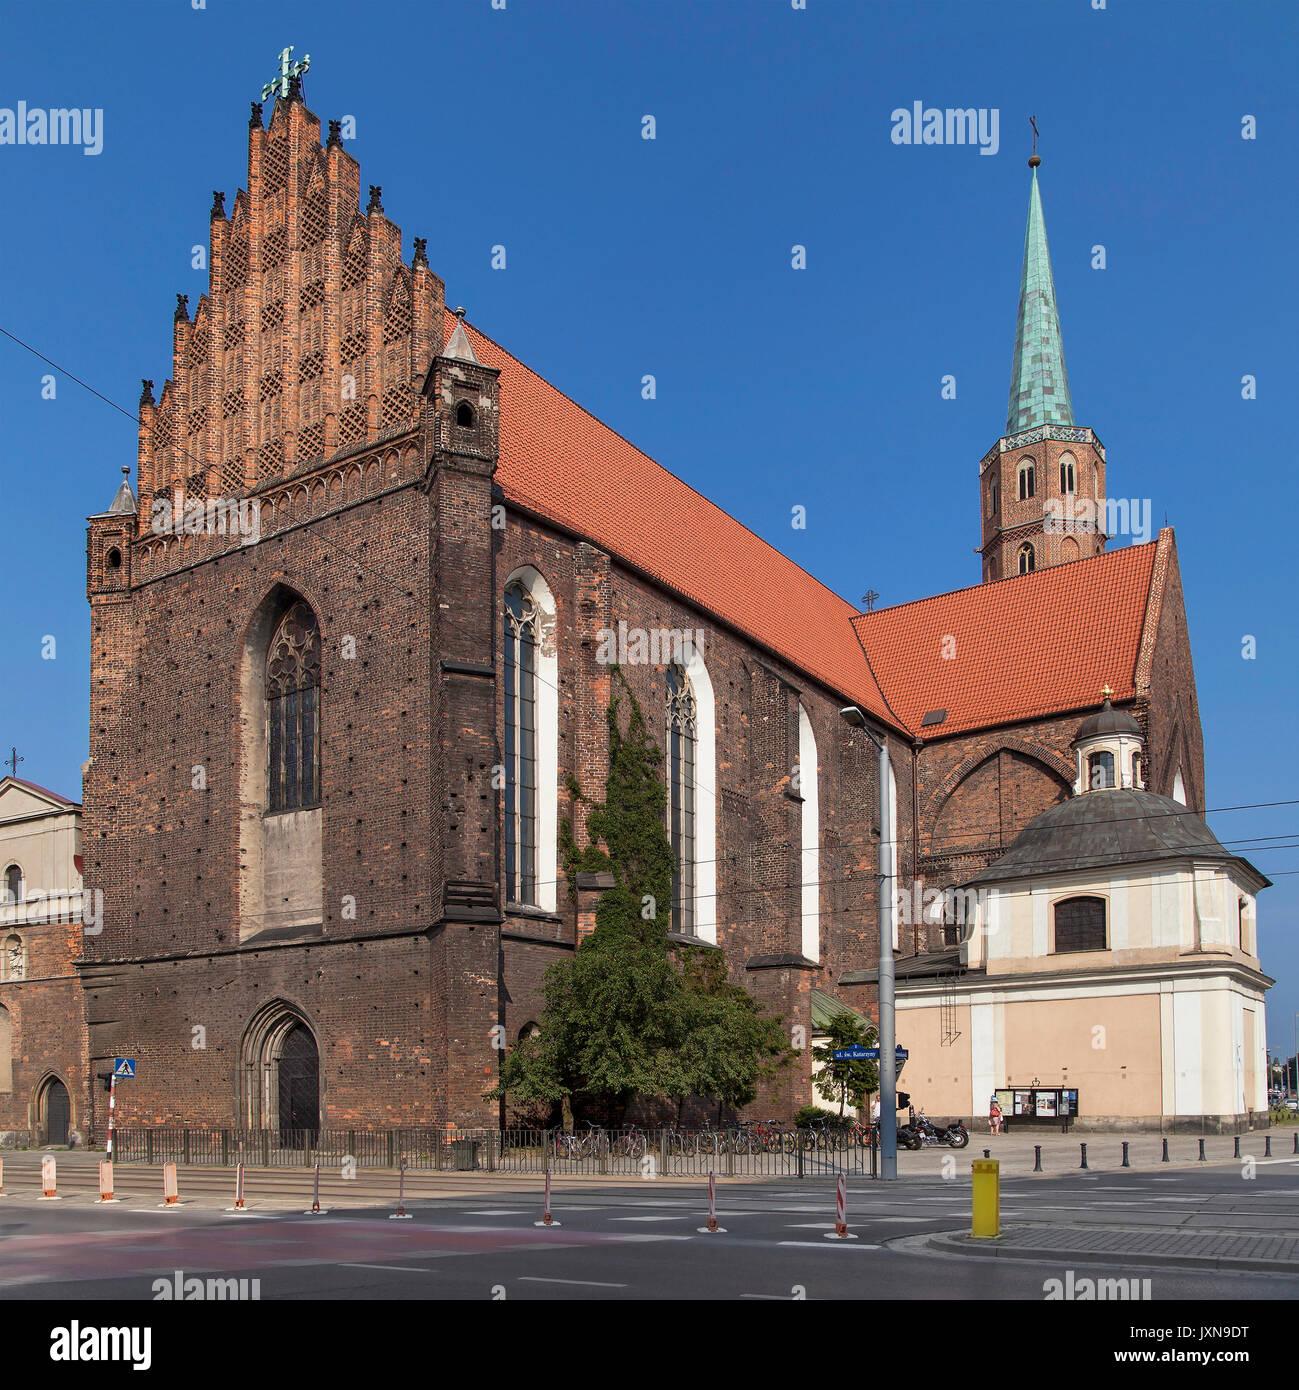 Church of Saint Adalbert in Wroclaw, Poland. Stock Photo